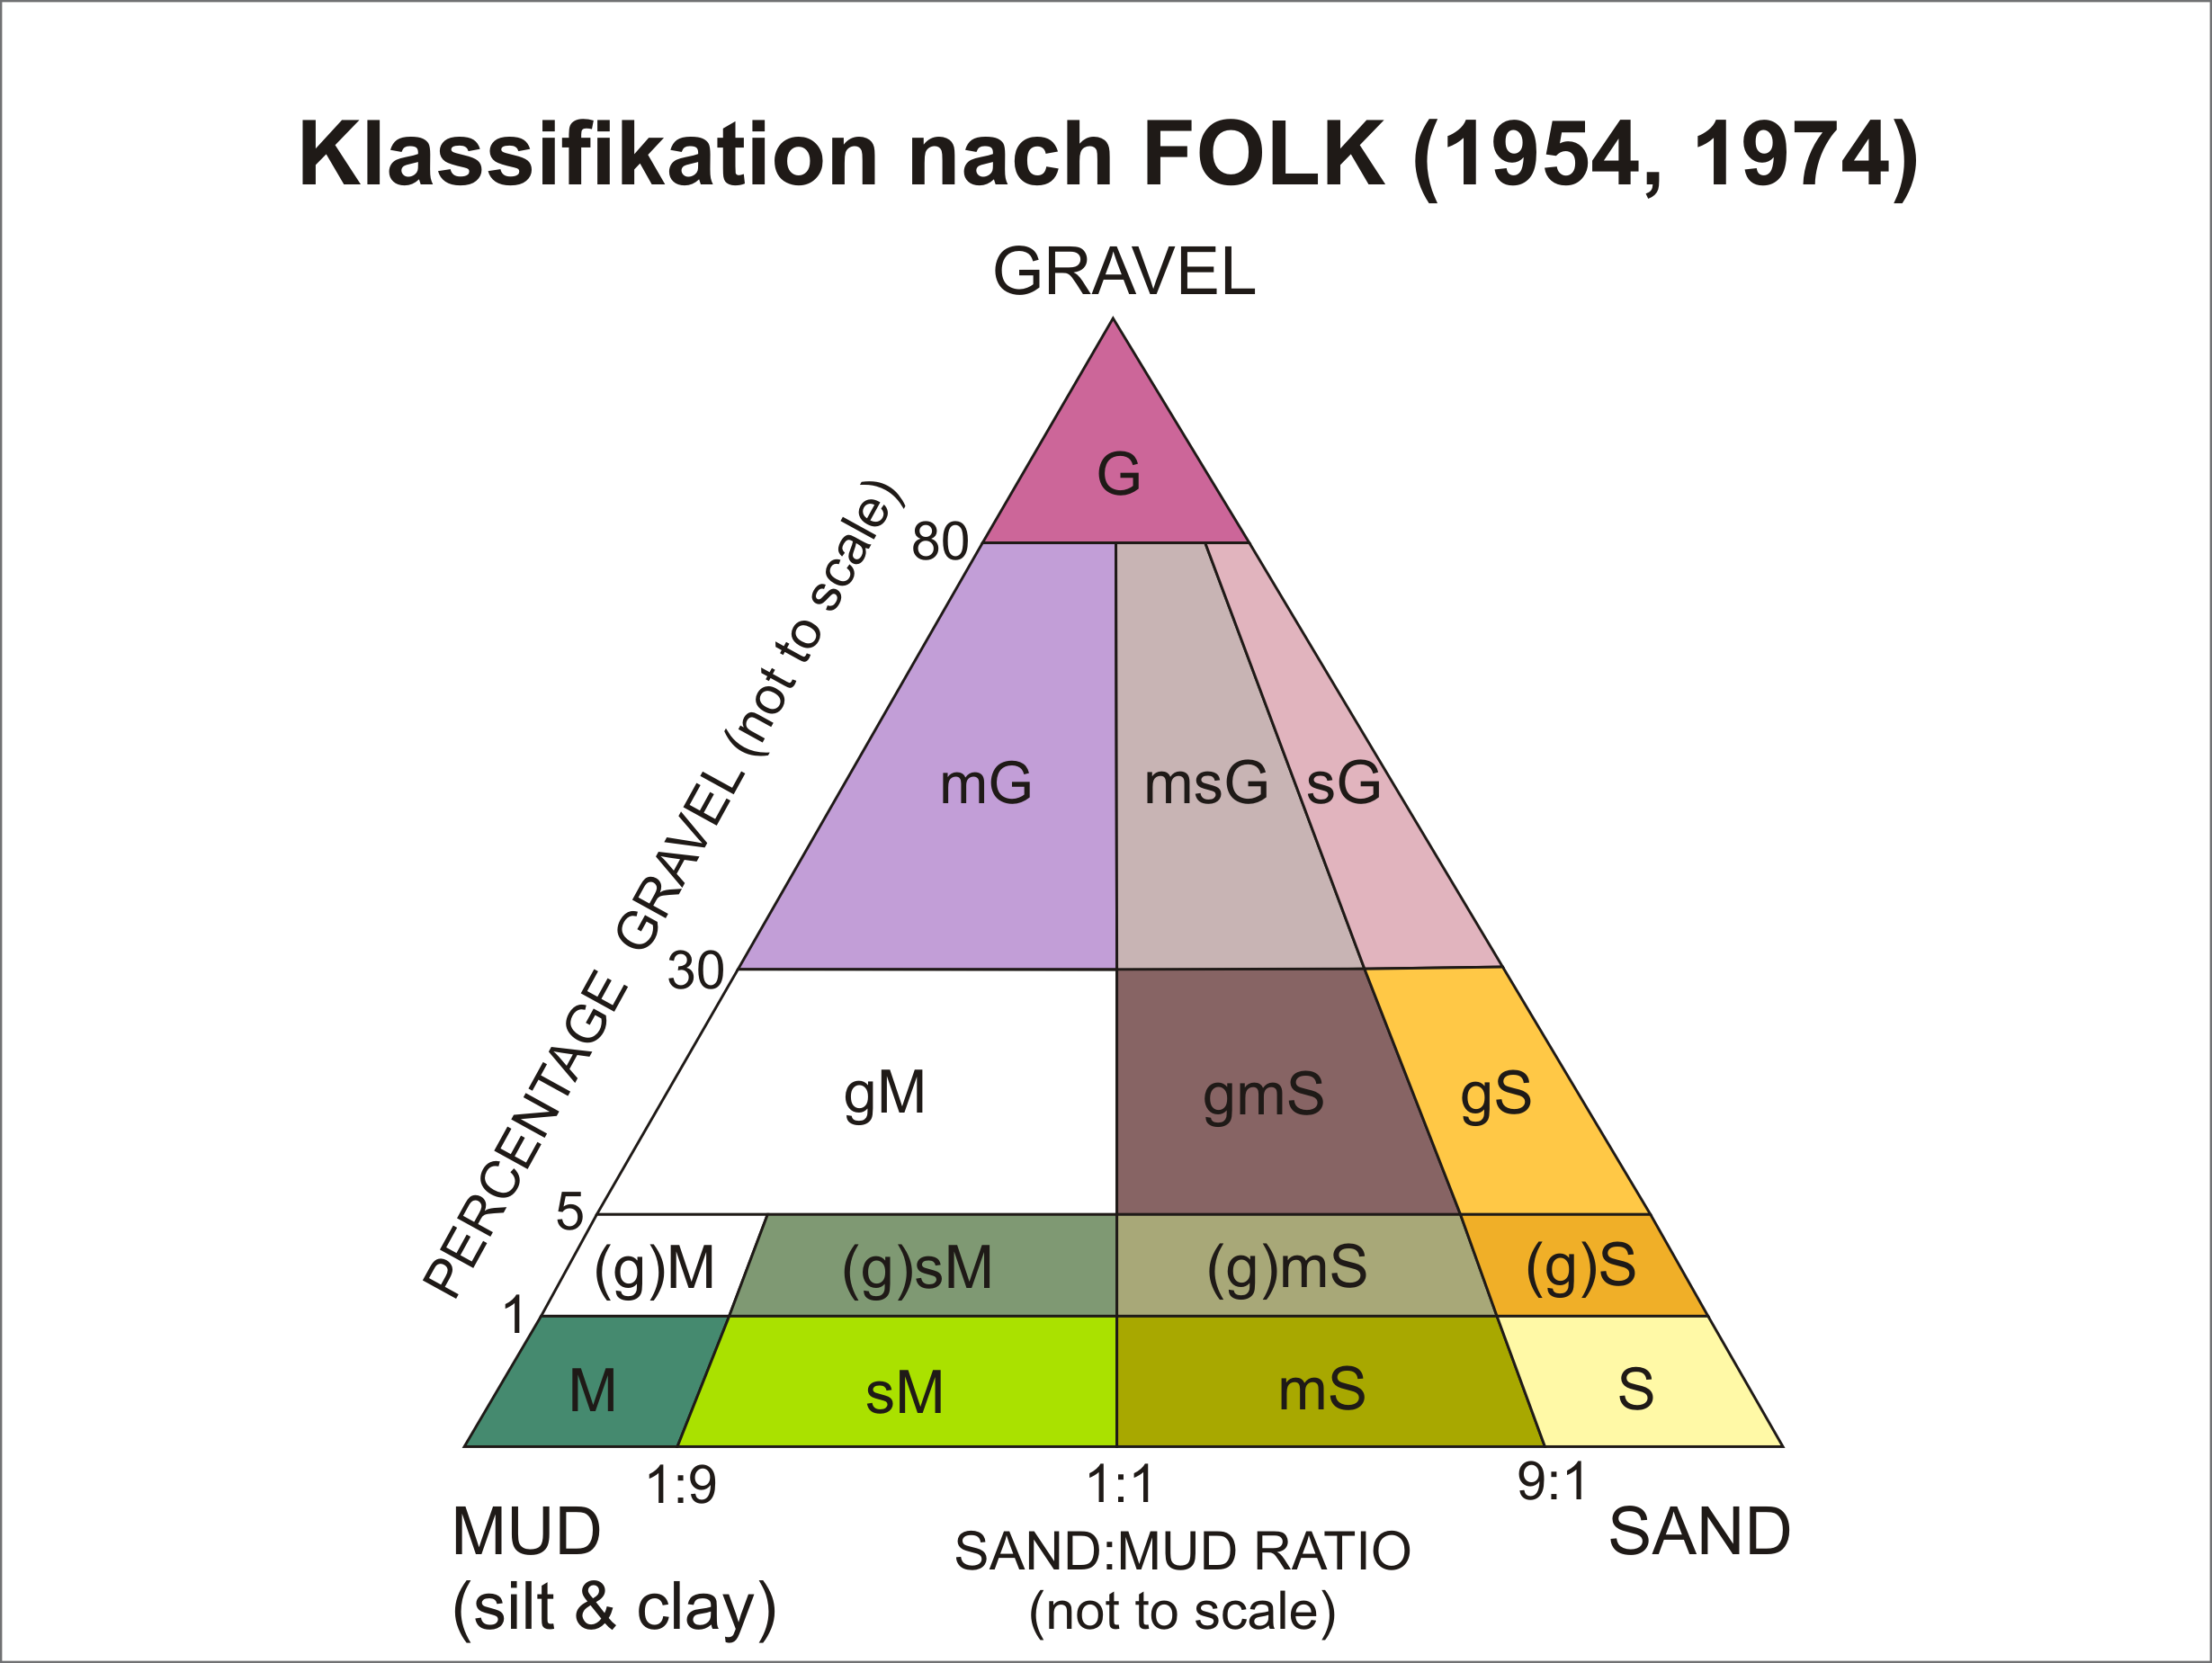 FOLK_Klassifikation_fürThemenreise.png